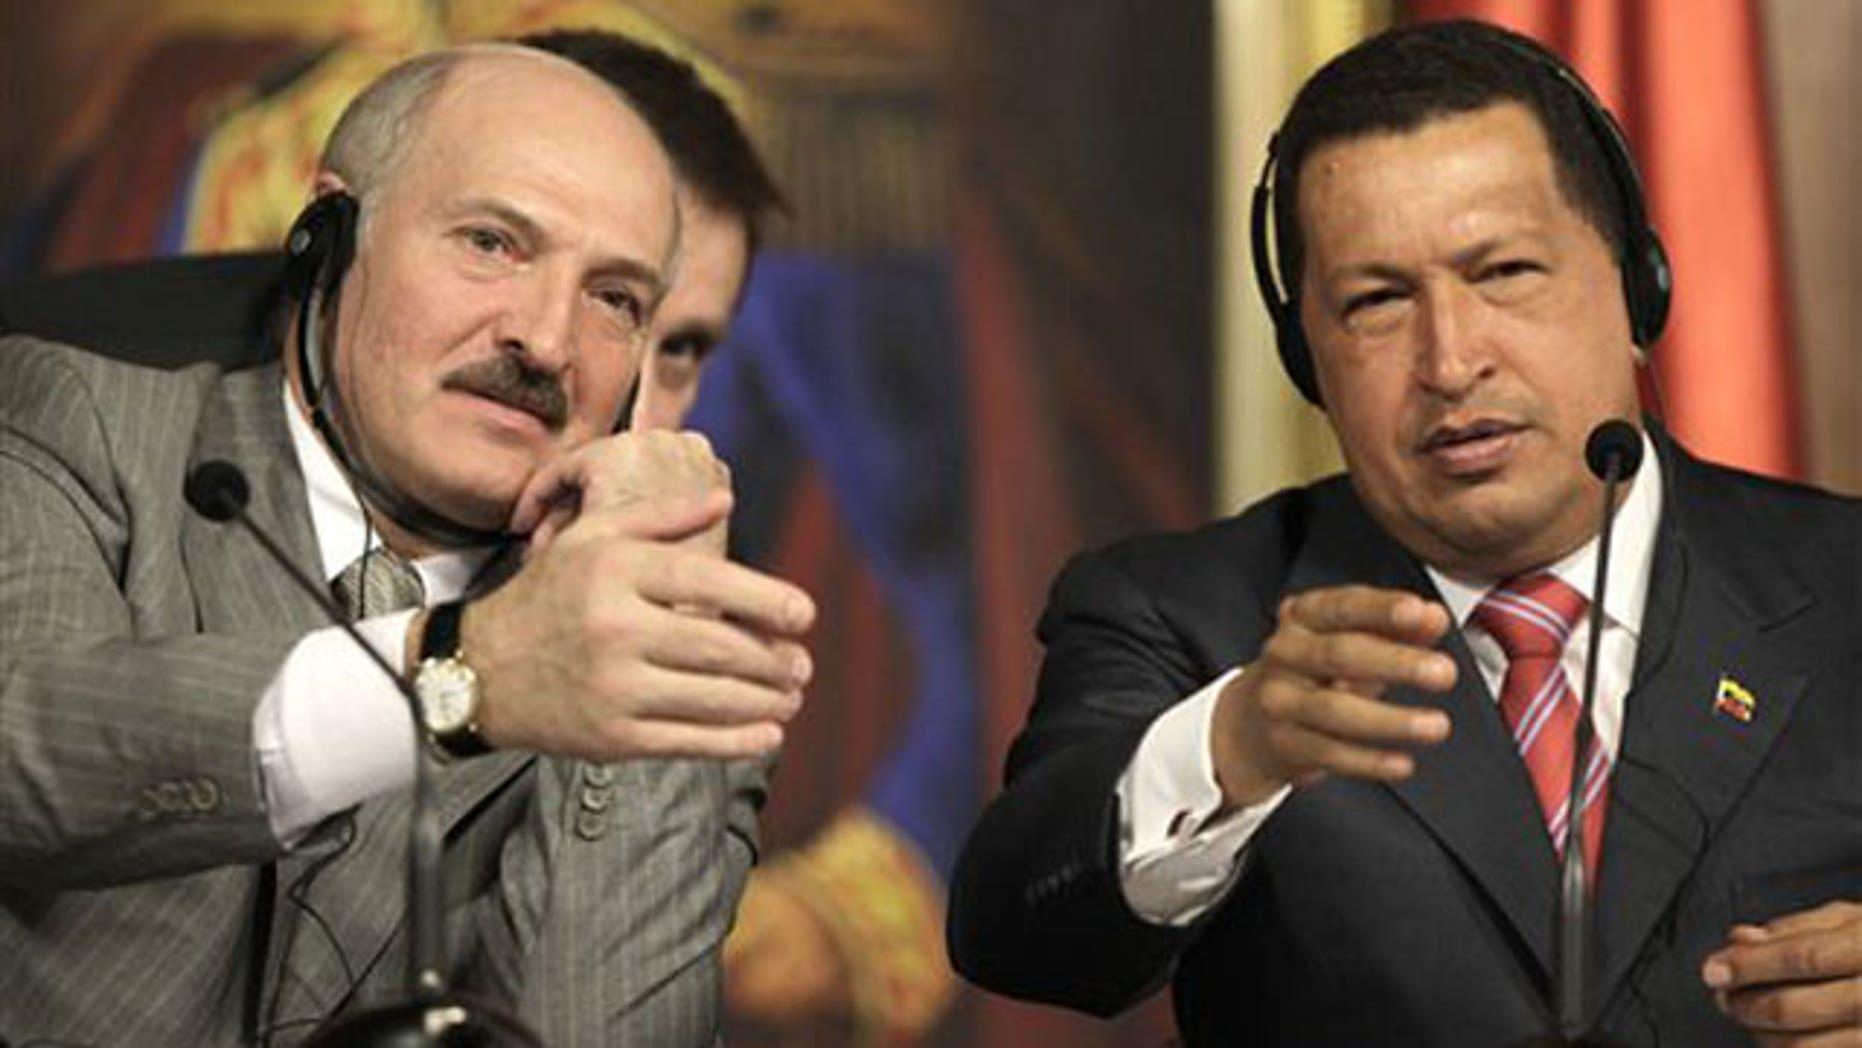 March 17: Belarus' President Alexander Lukashenko, left, and Venezuela's President Hugo Chavez. AP